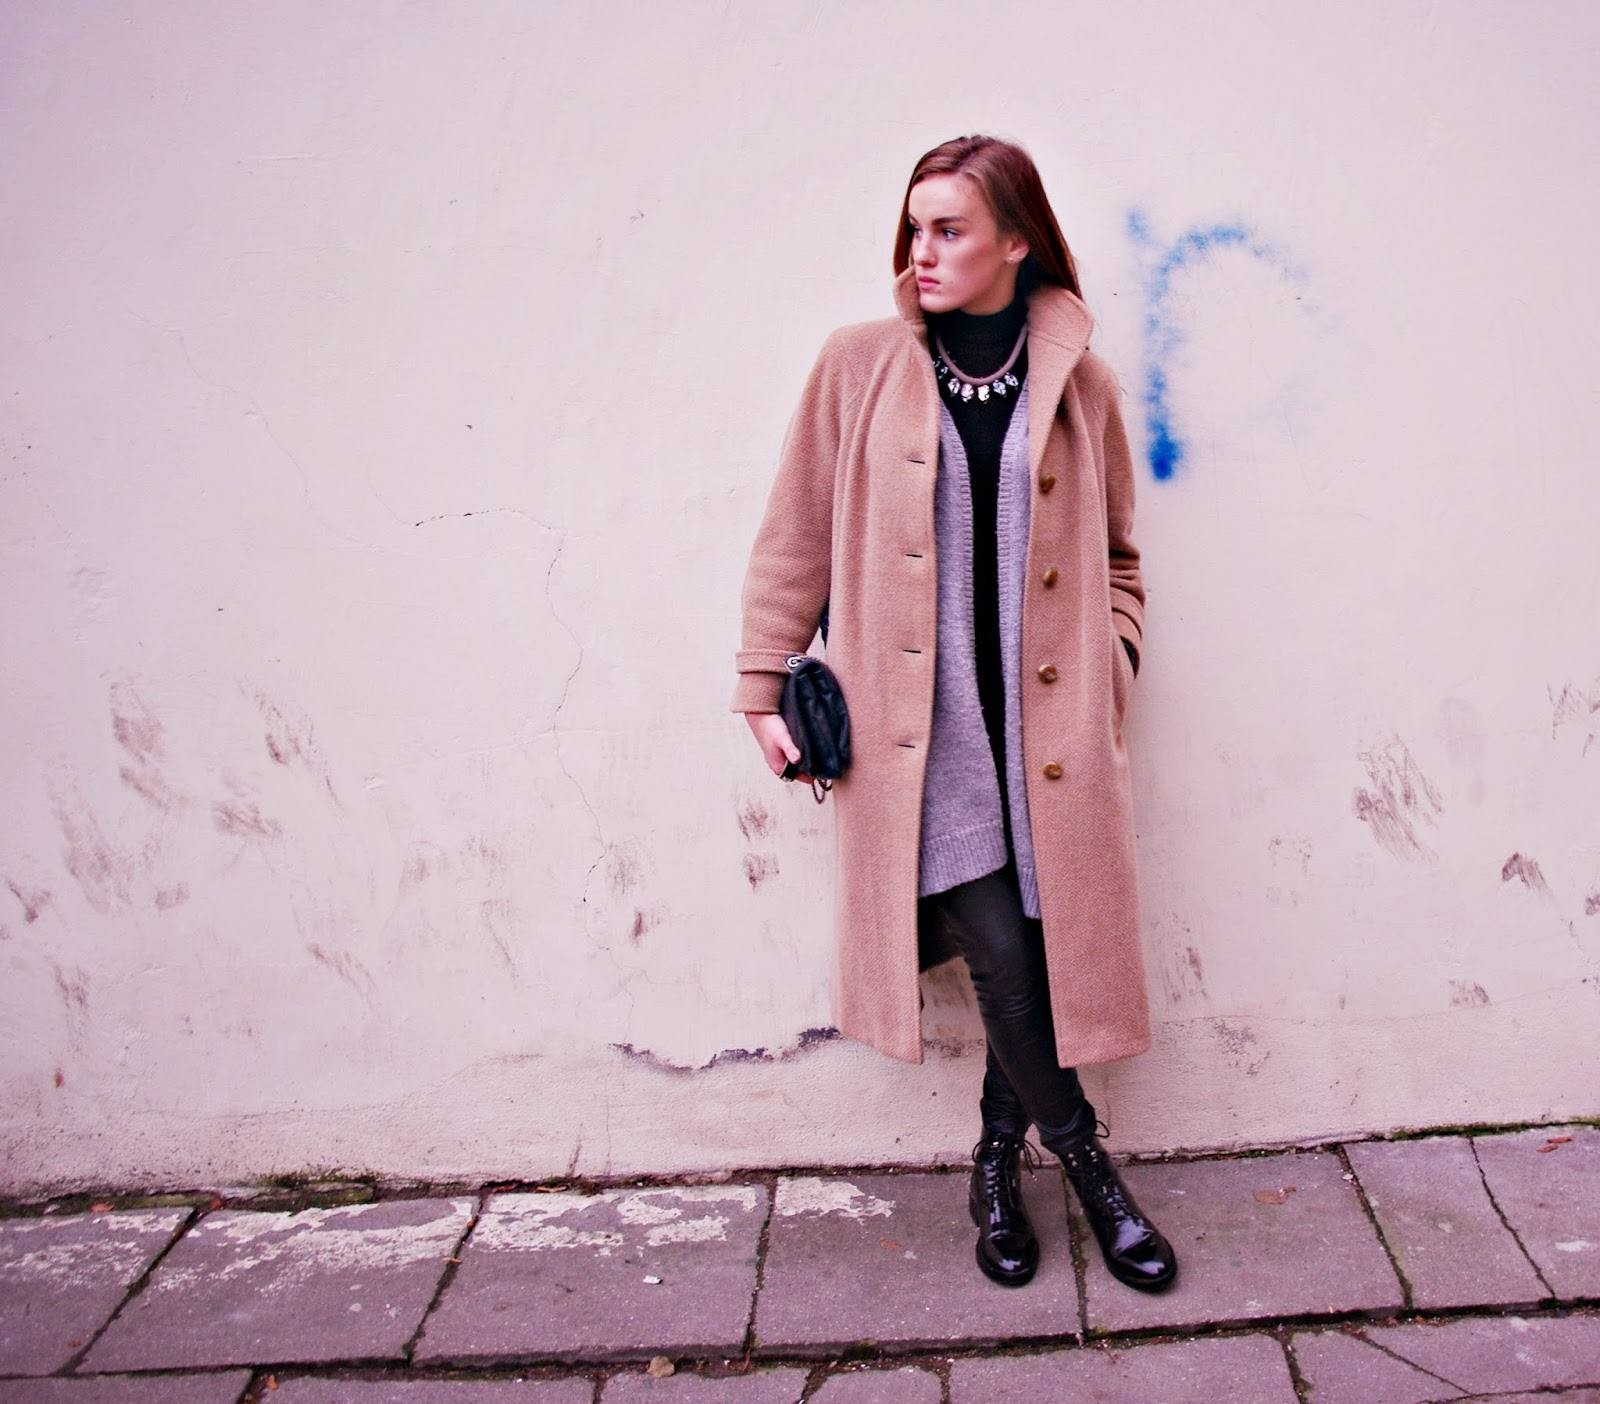 f4cd5ac26986 coat : thrifted | scarf : h&m | cardigan : h&m | pants : h&m | shoes : zara  | turtleneck : zara | clutch : vinted.lt | necklace : illusion.lt | watch :  ...